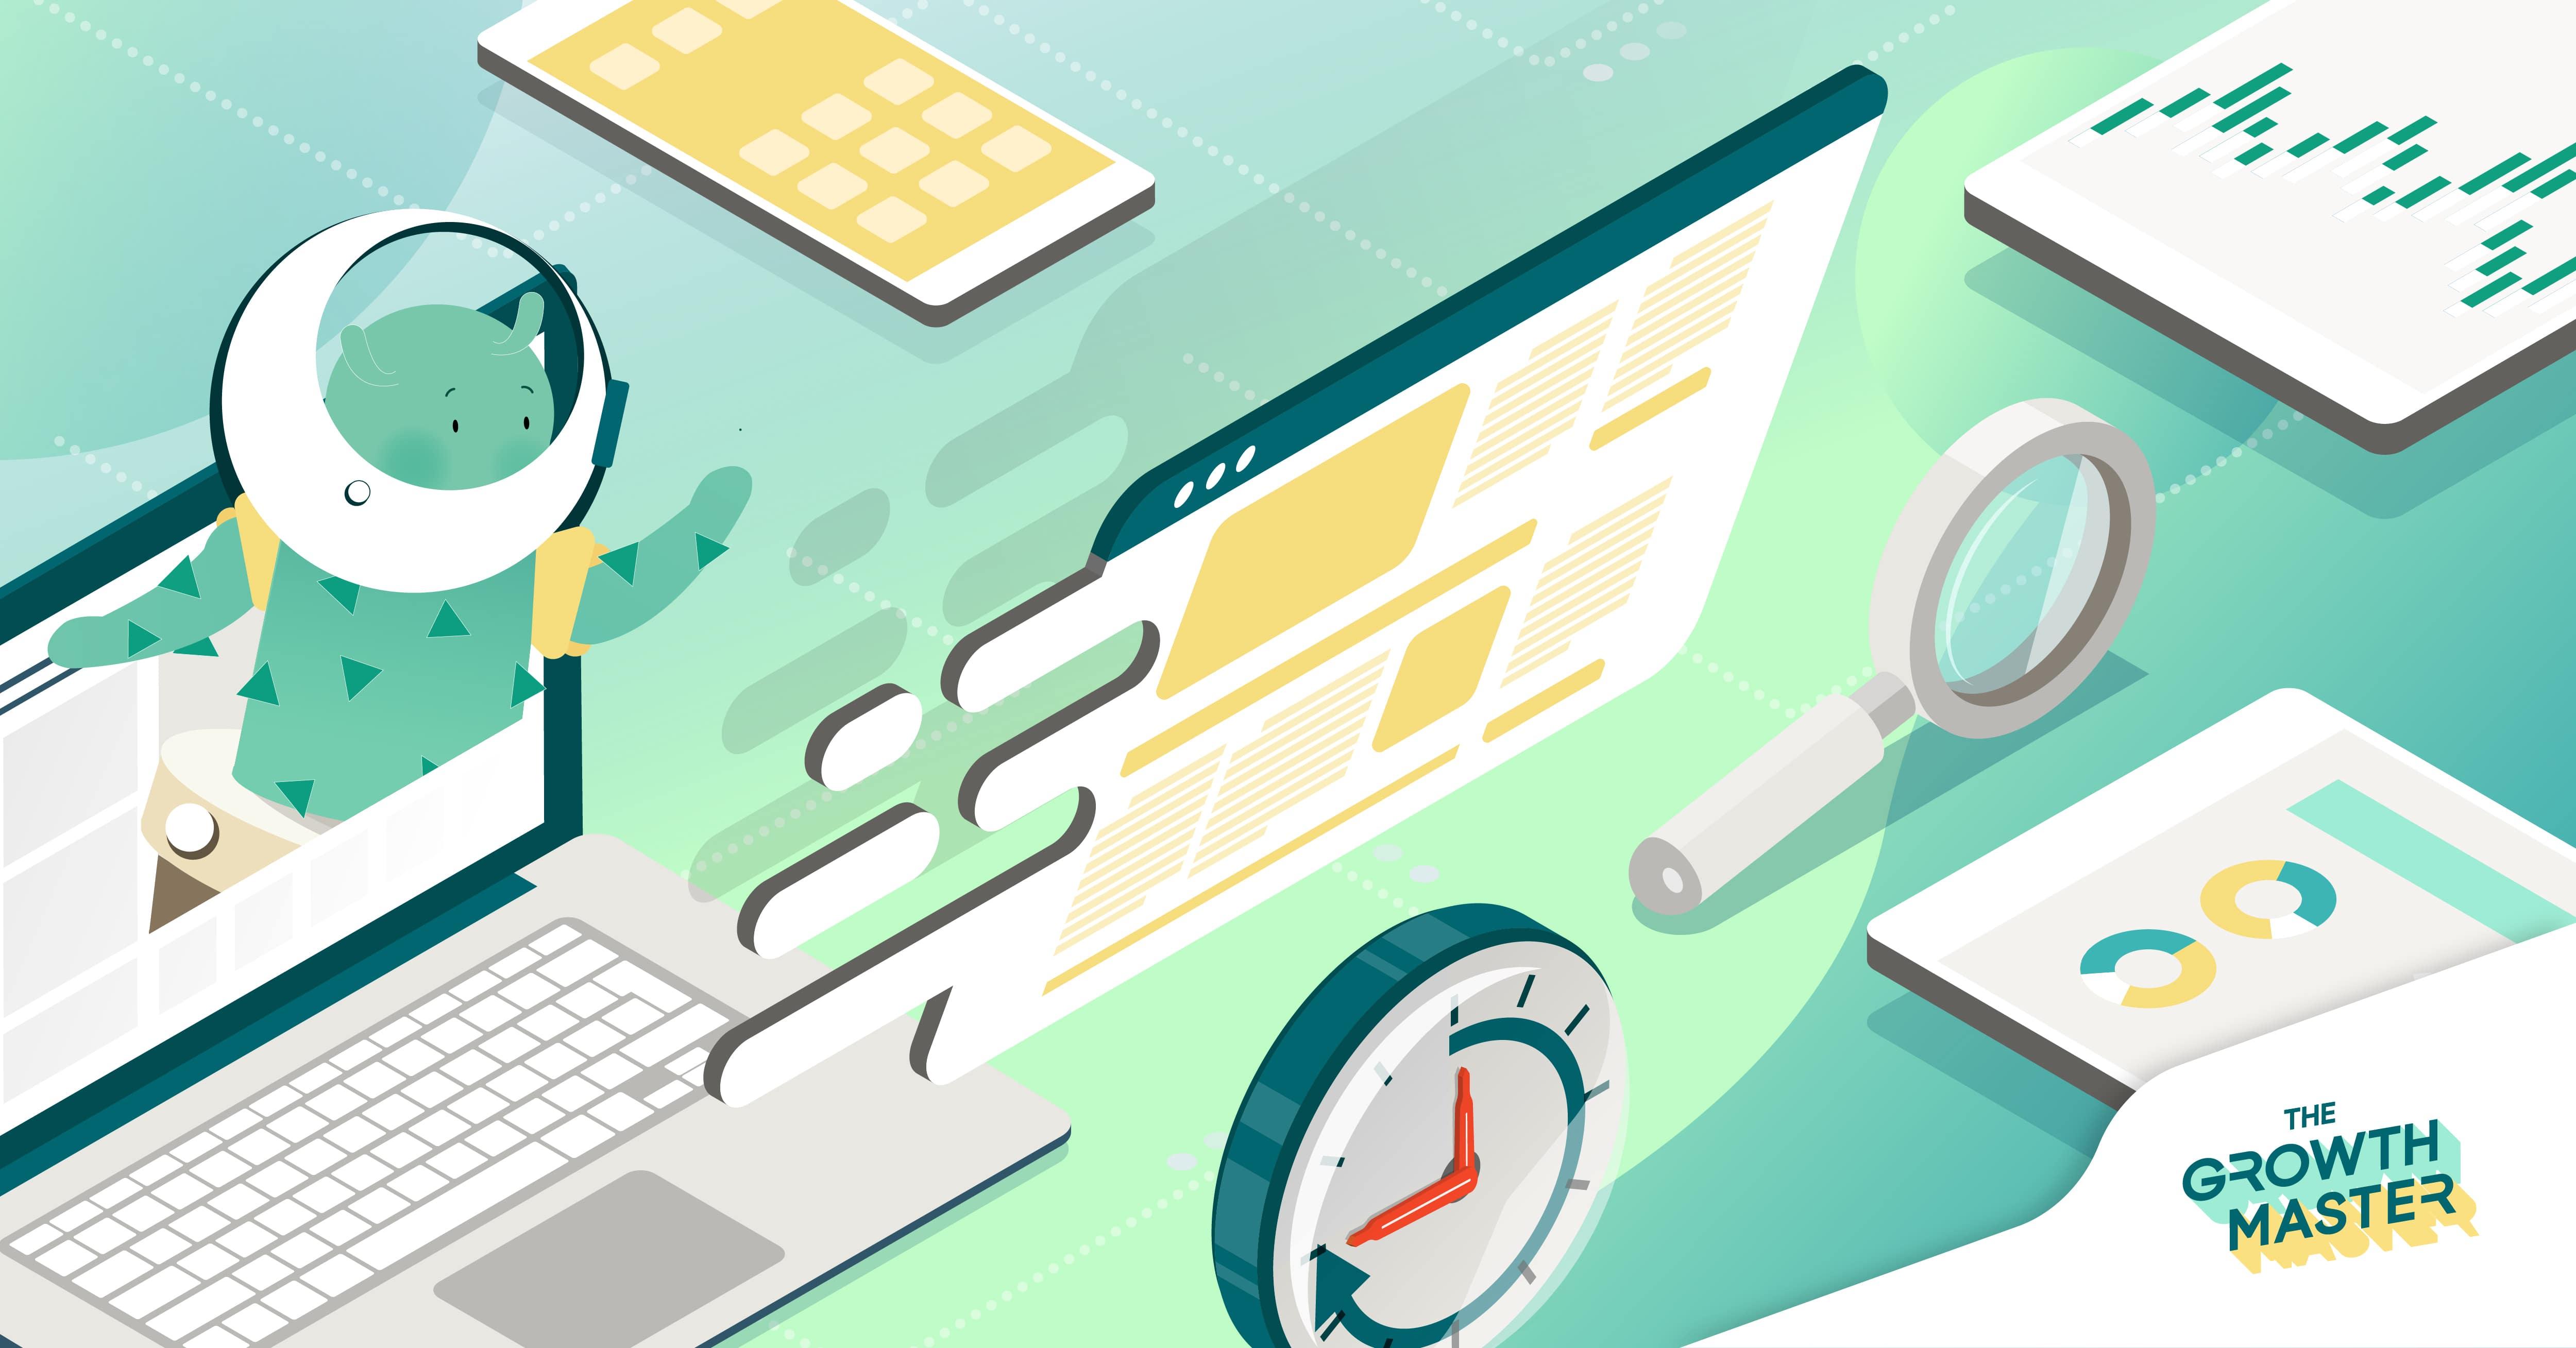 Page Speed Optimization ปรับแต่งเว็บไซต์อย่างไรให้โหลดได้เร็วขึ้น ไม่พลาดทุกโอกาสทางธุรกิจ